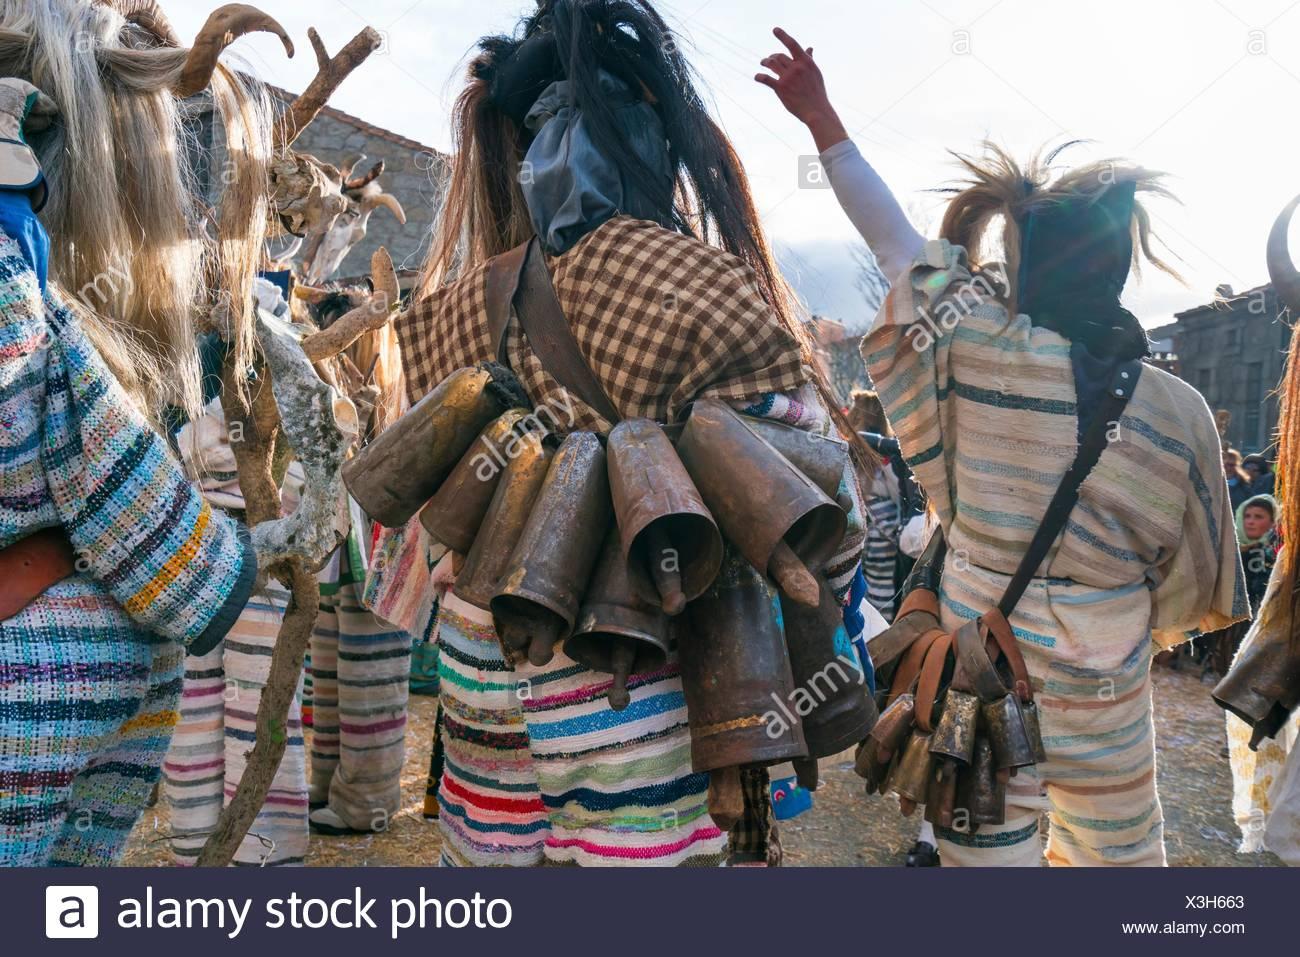 'Los Cucurrumachos'', scary looking evil carnival characters Navalosa, Avila Province, Castile-León, Spain - Stock Image